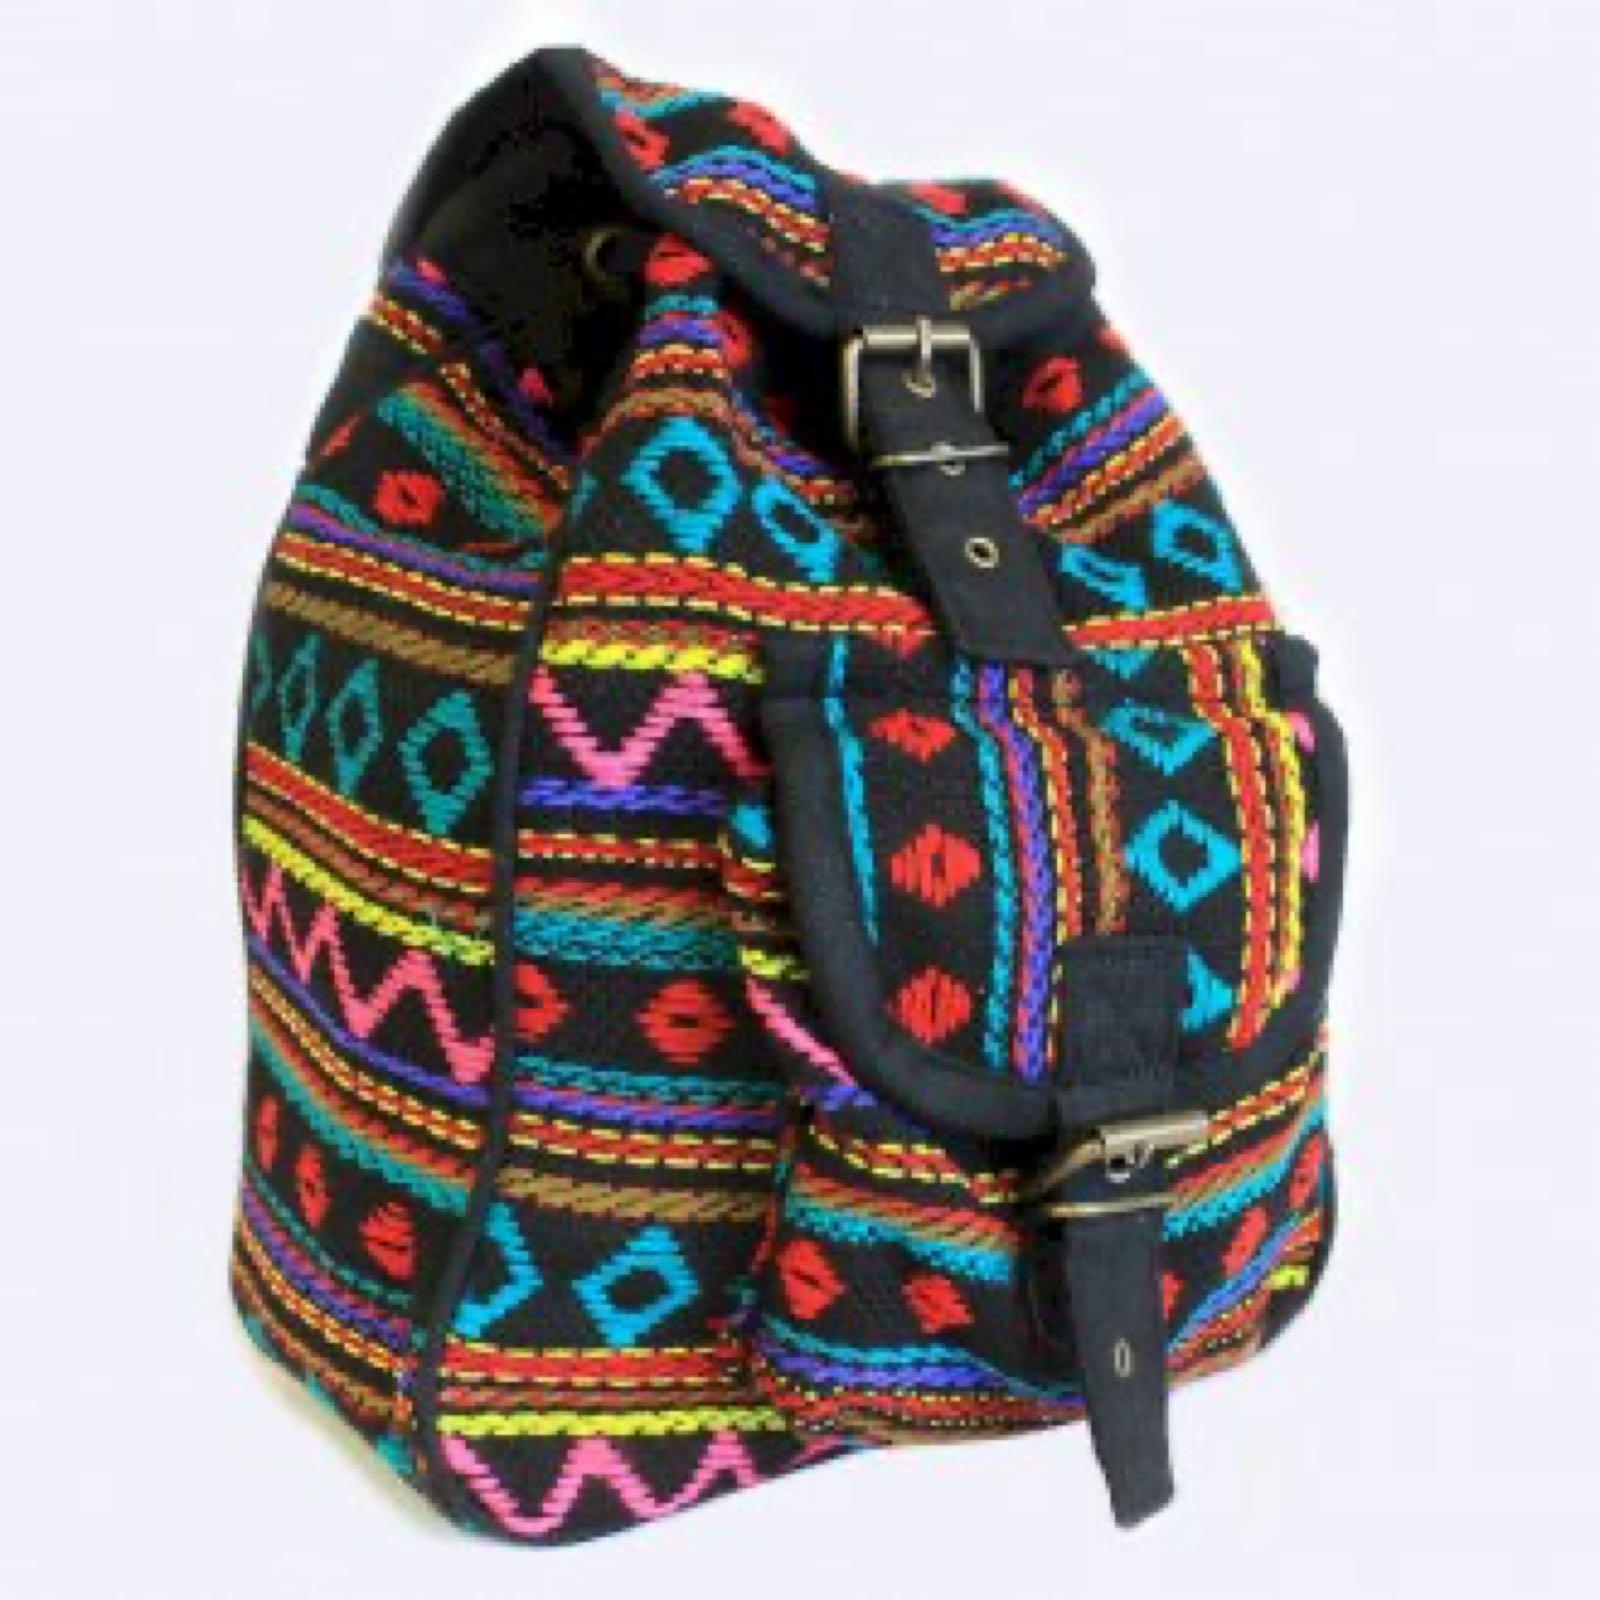 Turquoise Nepali Backpack